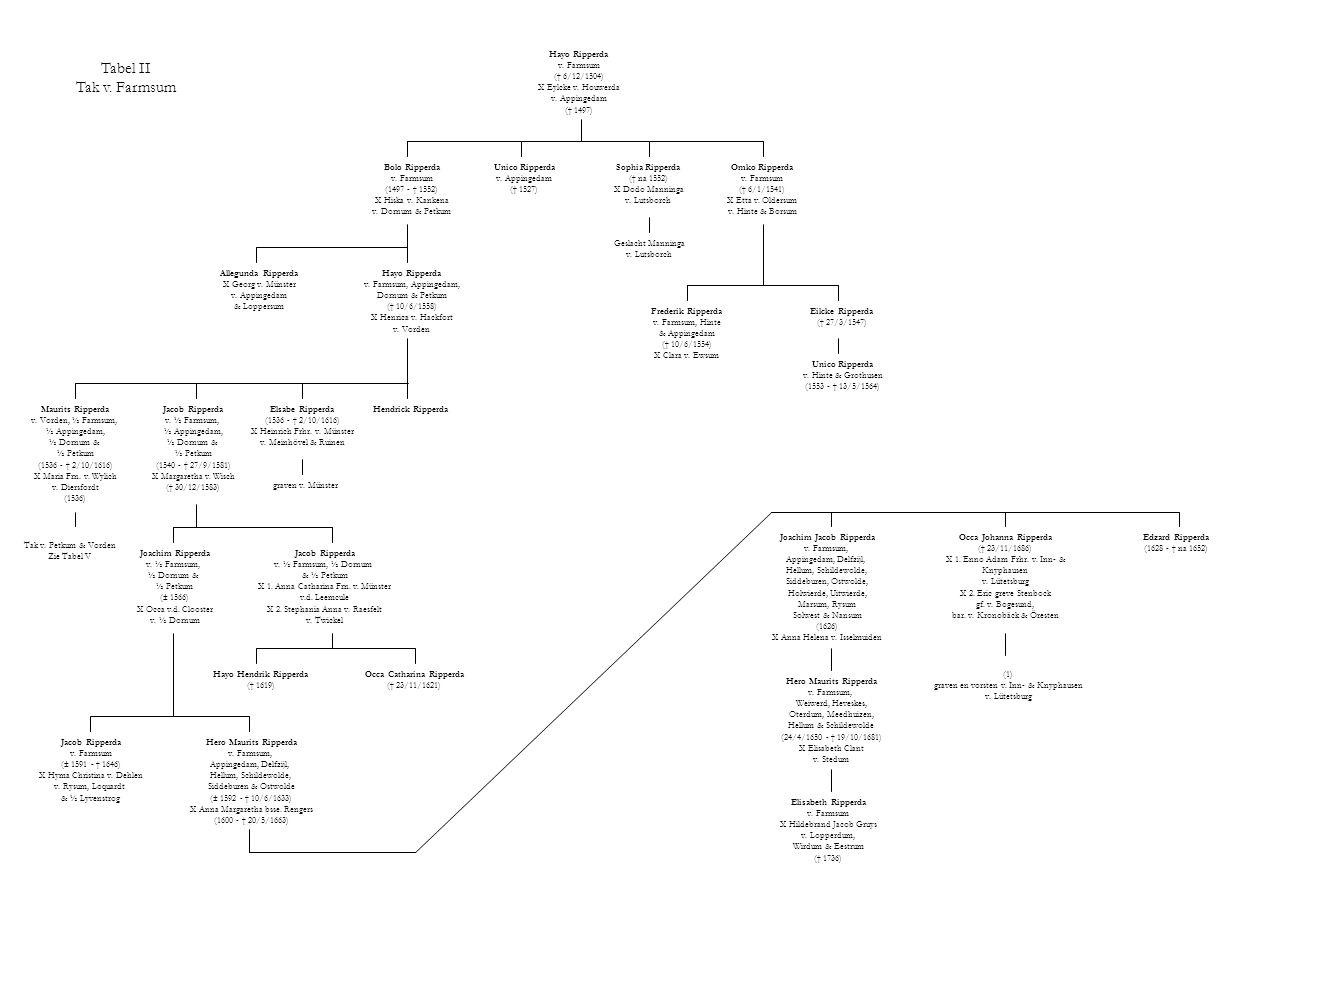 Tabel II Tak v. Farmsum Hayo Ripperda v. Farmsum († 6/12/1504) X Eylcke v. Houwerda v. Appingedam († 1497) Bolo Ripperda v. Farmsum (1497 - † 1552) X